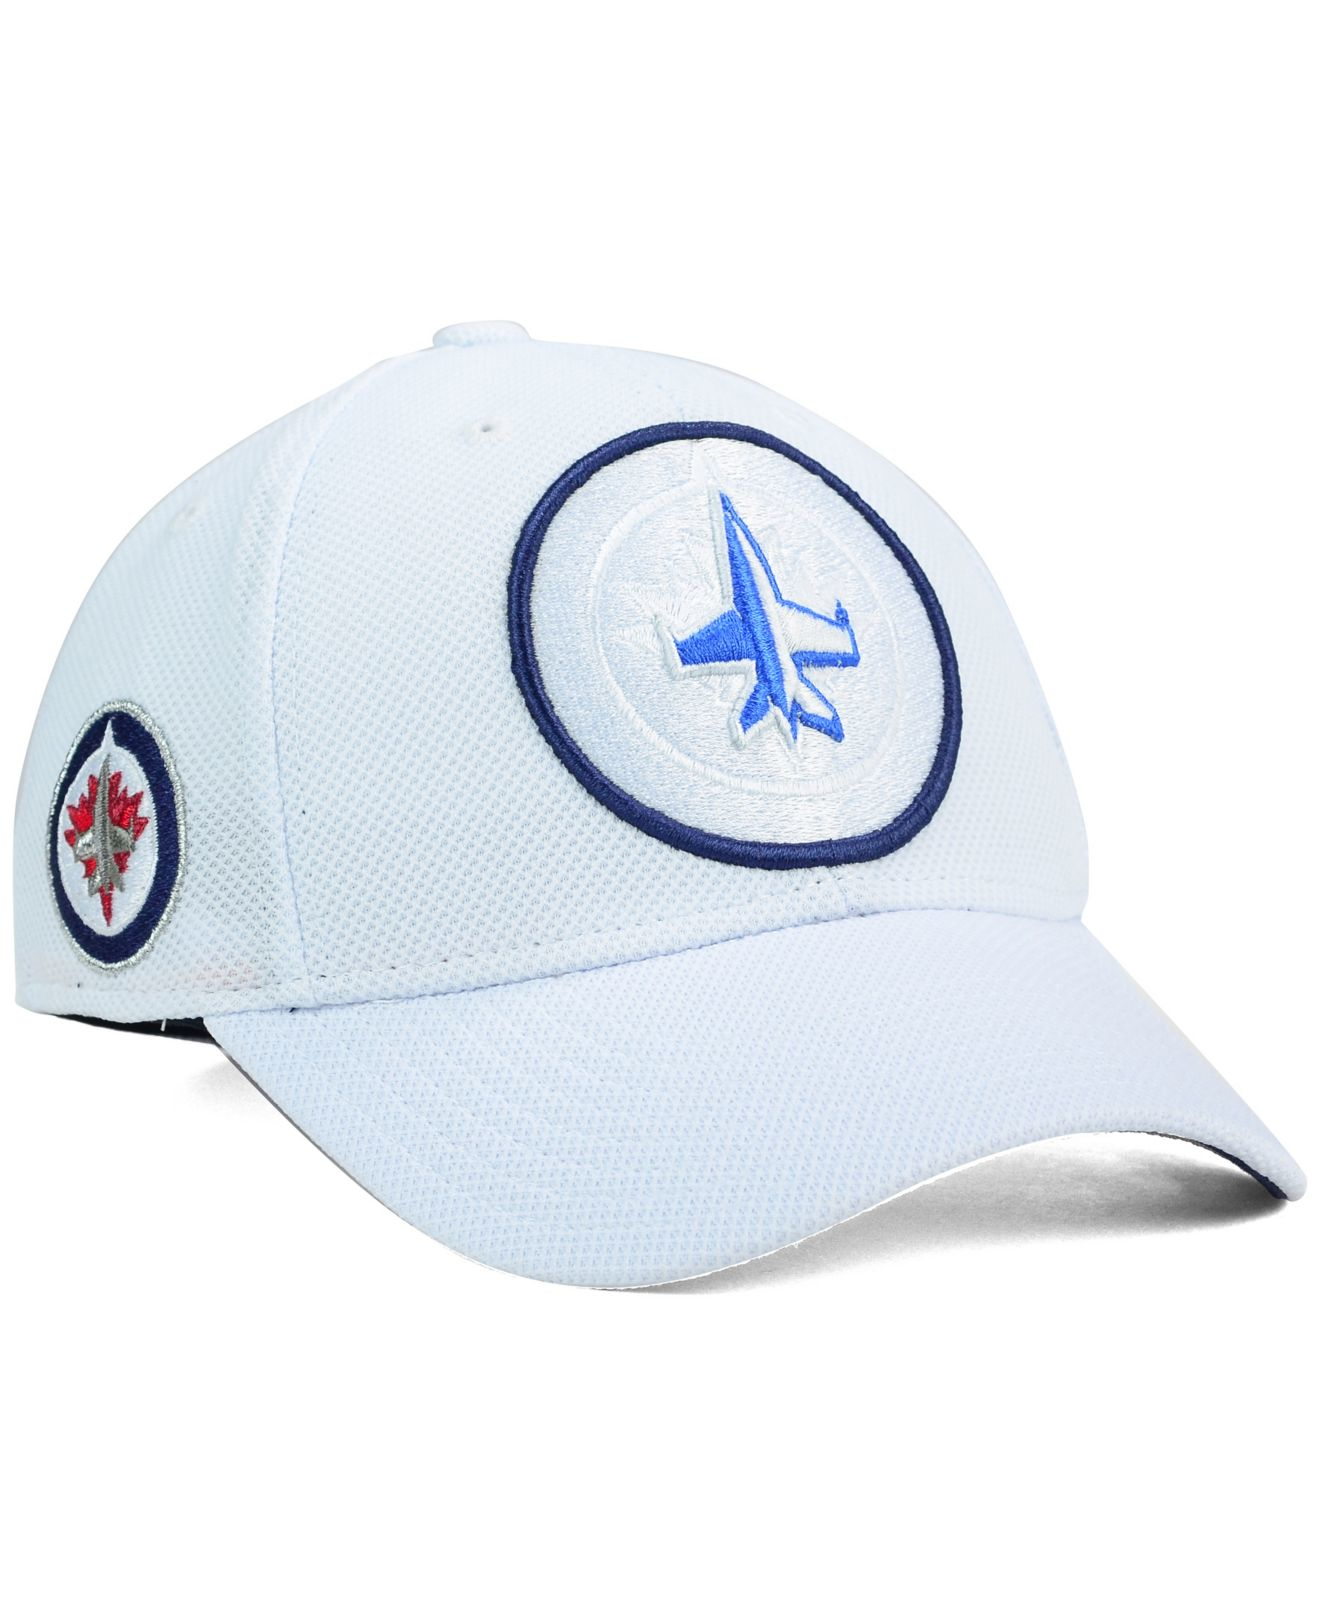 6da7128c37af3 Reebok Winnipeg Jets 2nd Season Flex Cap in White for Men - Lyst